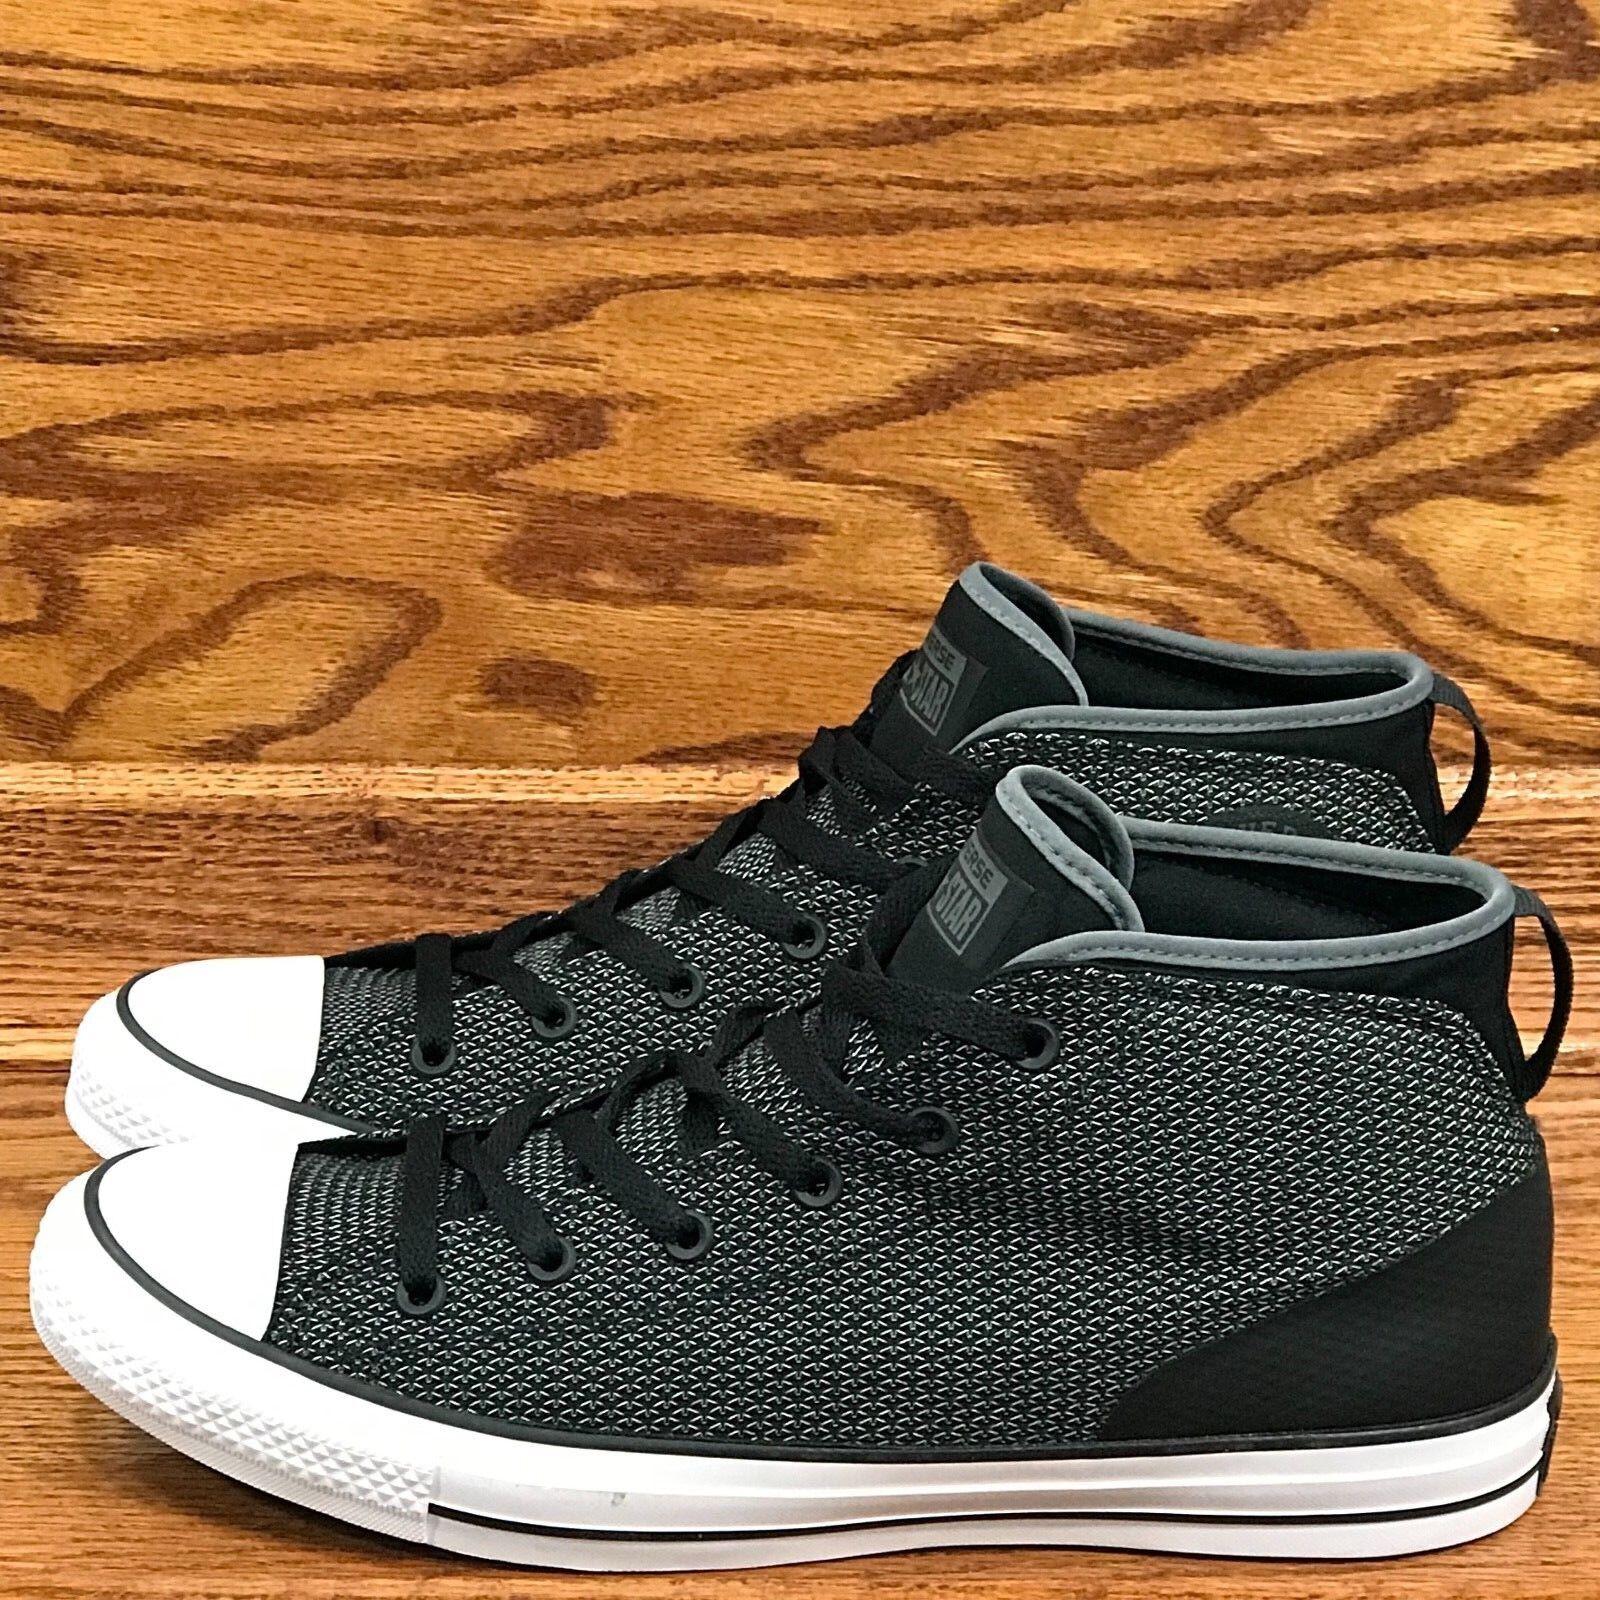 Converse Converse Converse CTAS Syde Street Mid Thunder nero bianca scarpe Dimensione Uomo 12 donna 14 7f7689